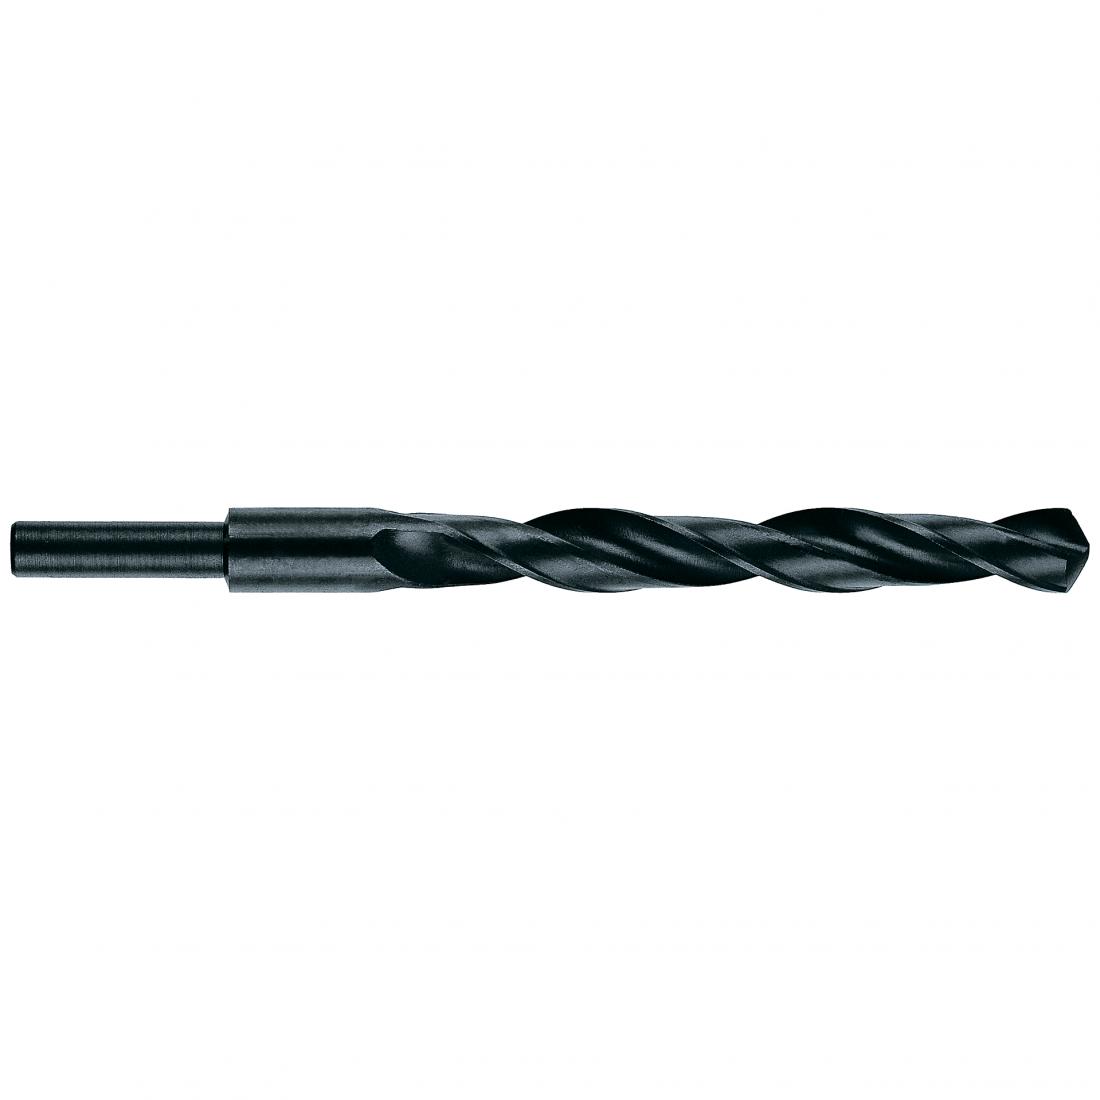 Сверло по металлу Heller HSS cо ступенчатым хвостовиком 14х108х160мм